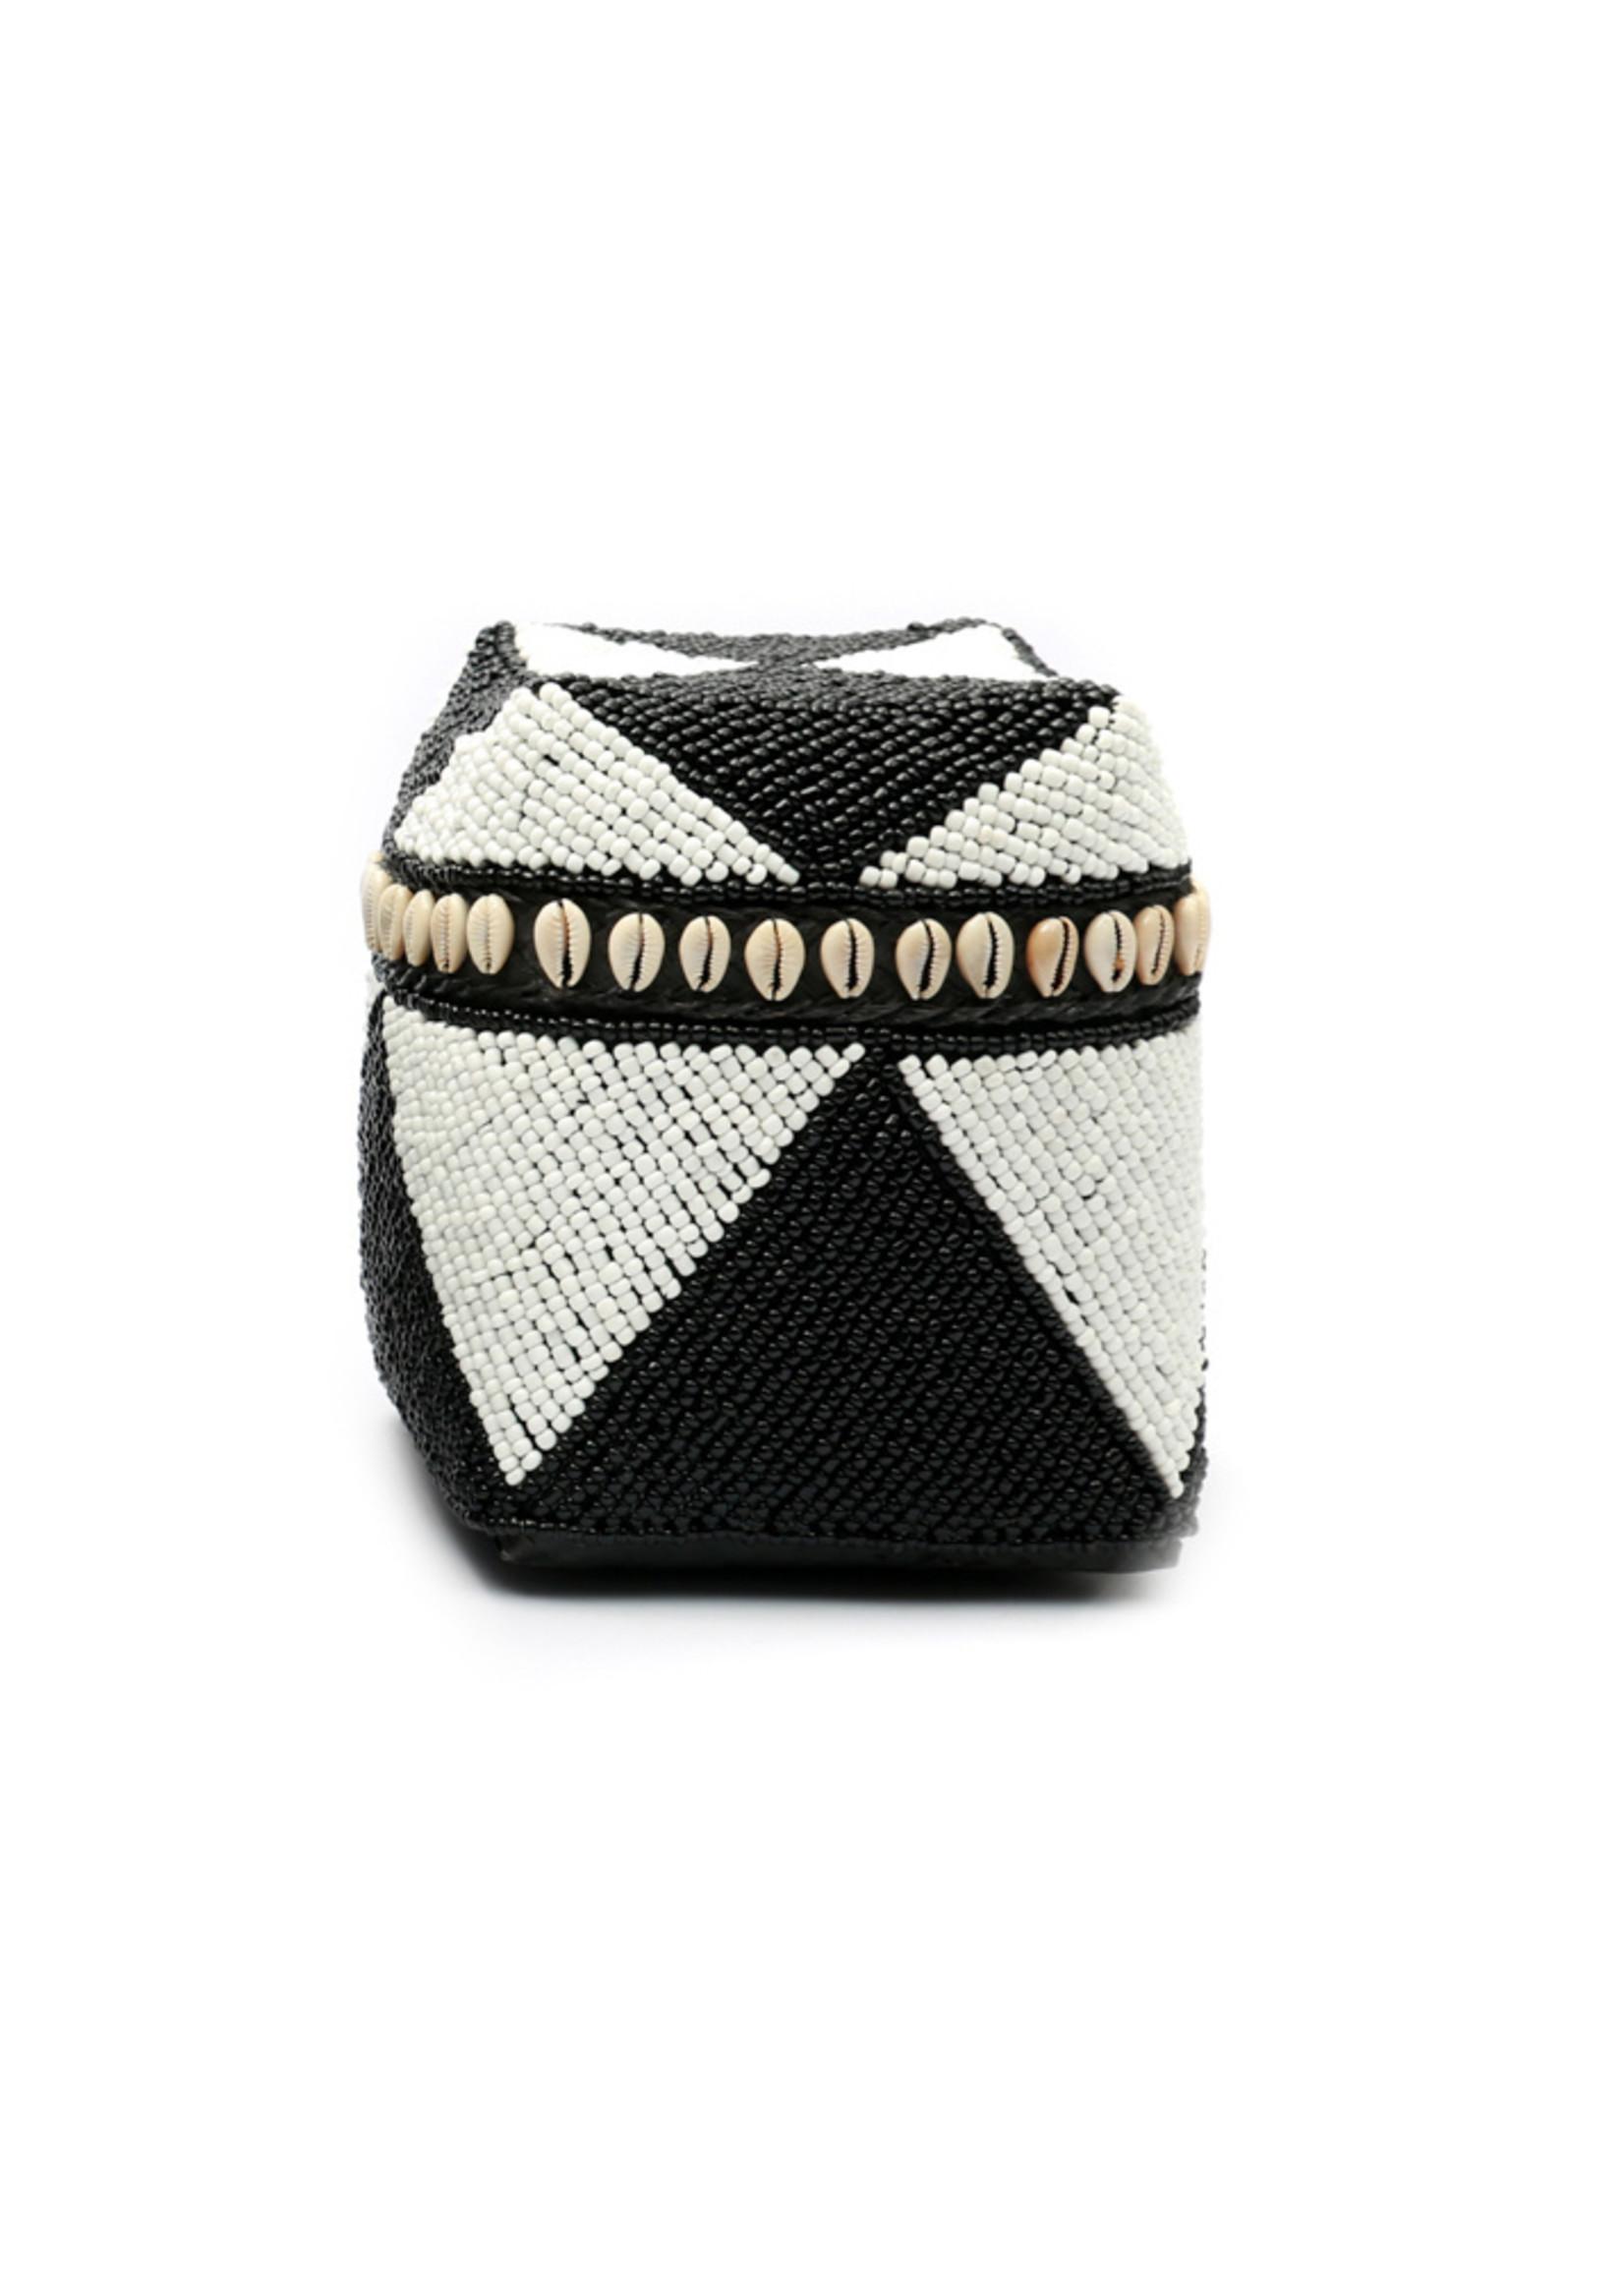 The Beaded Basket Cowrie Diamond High - Black White - S